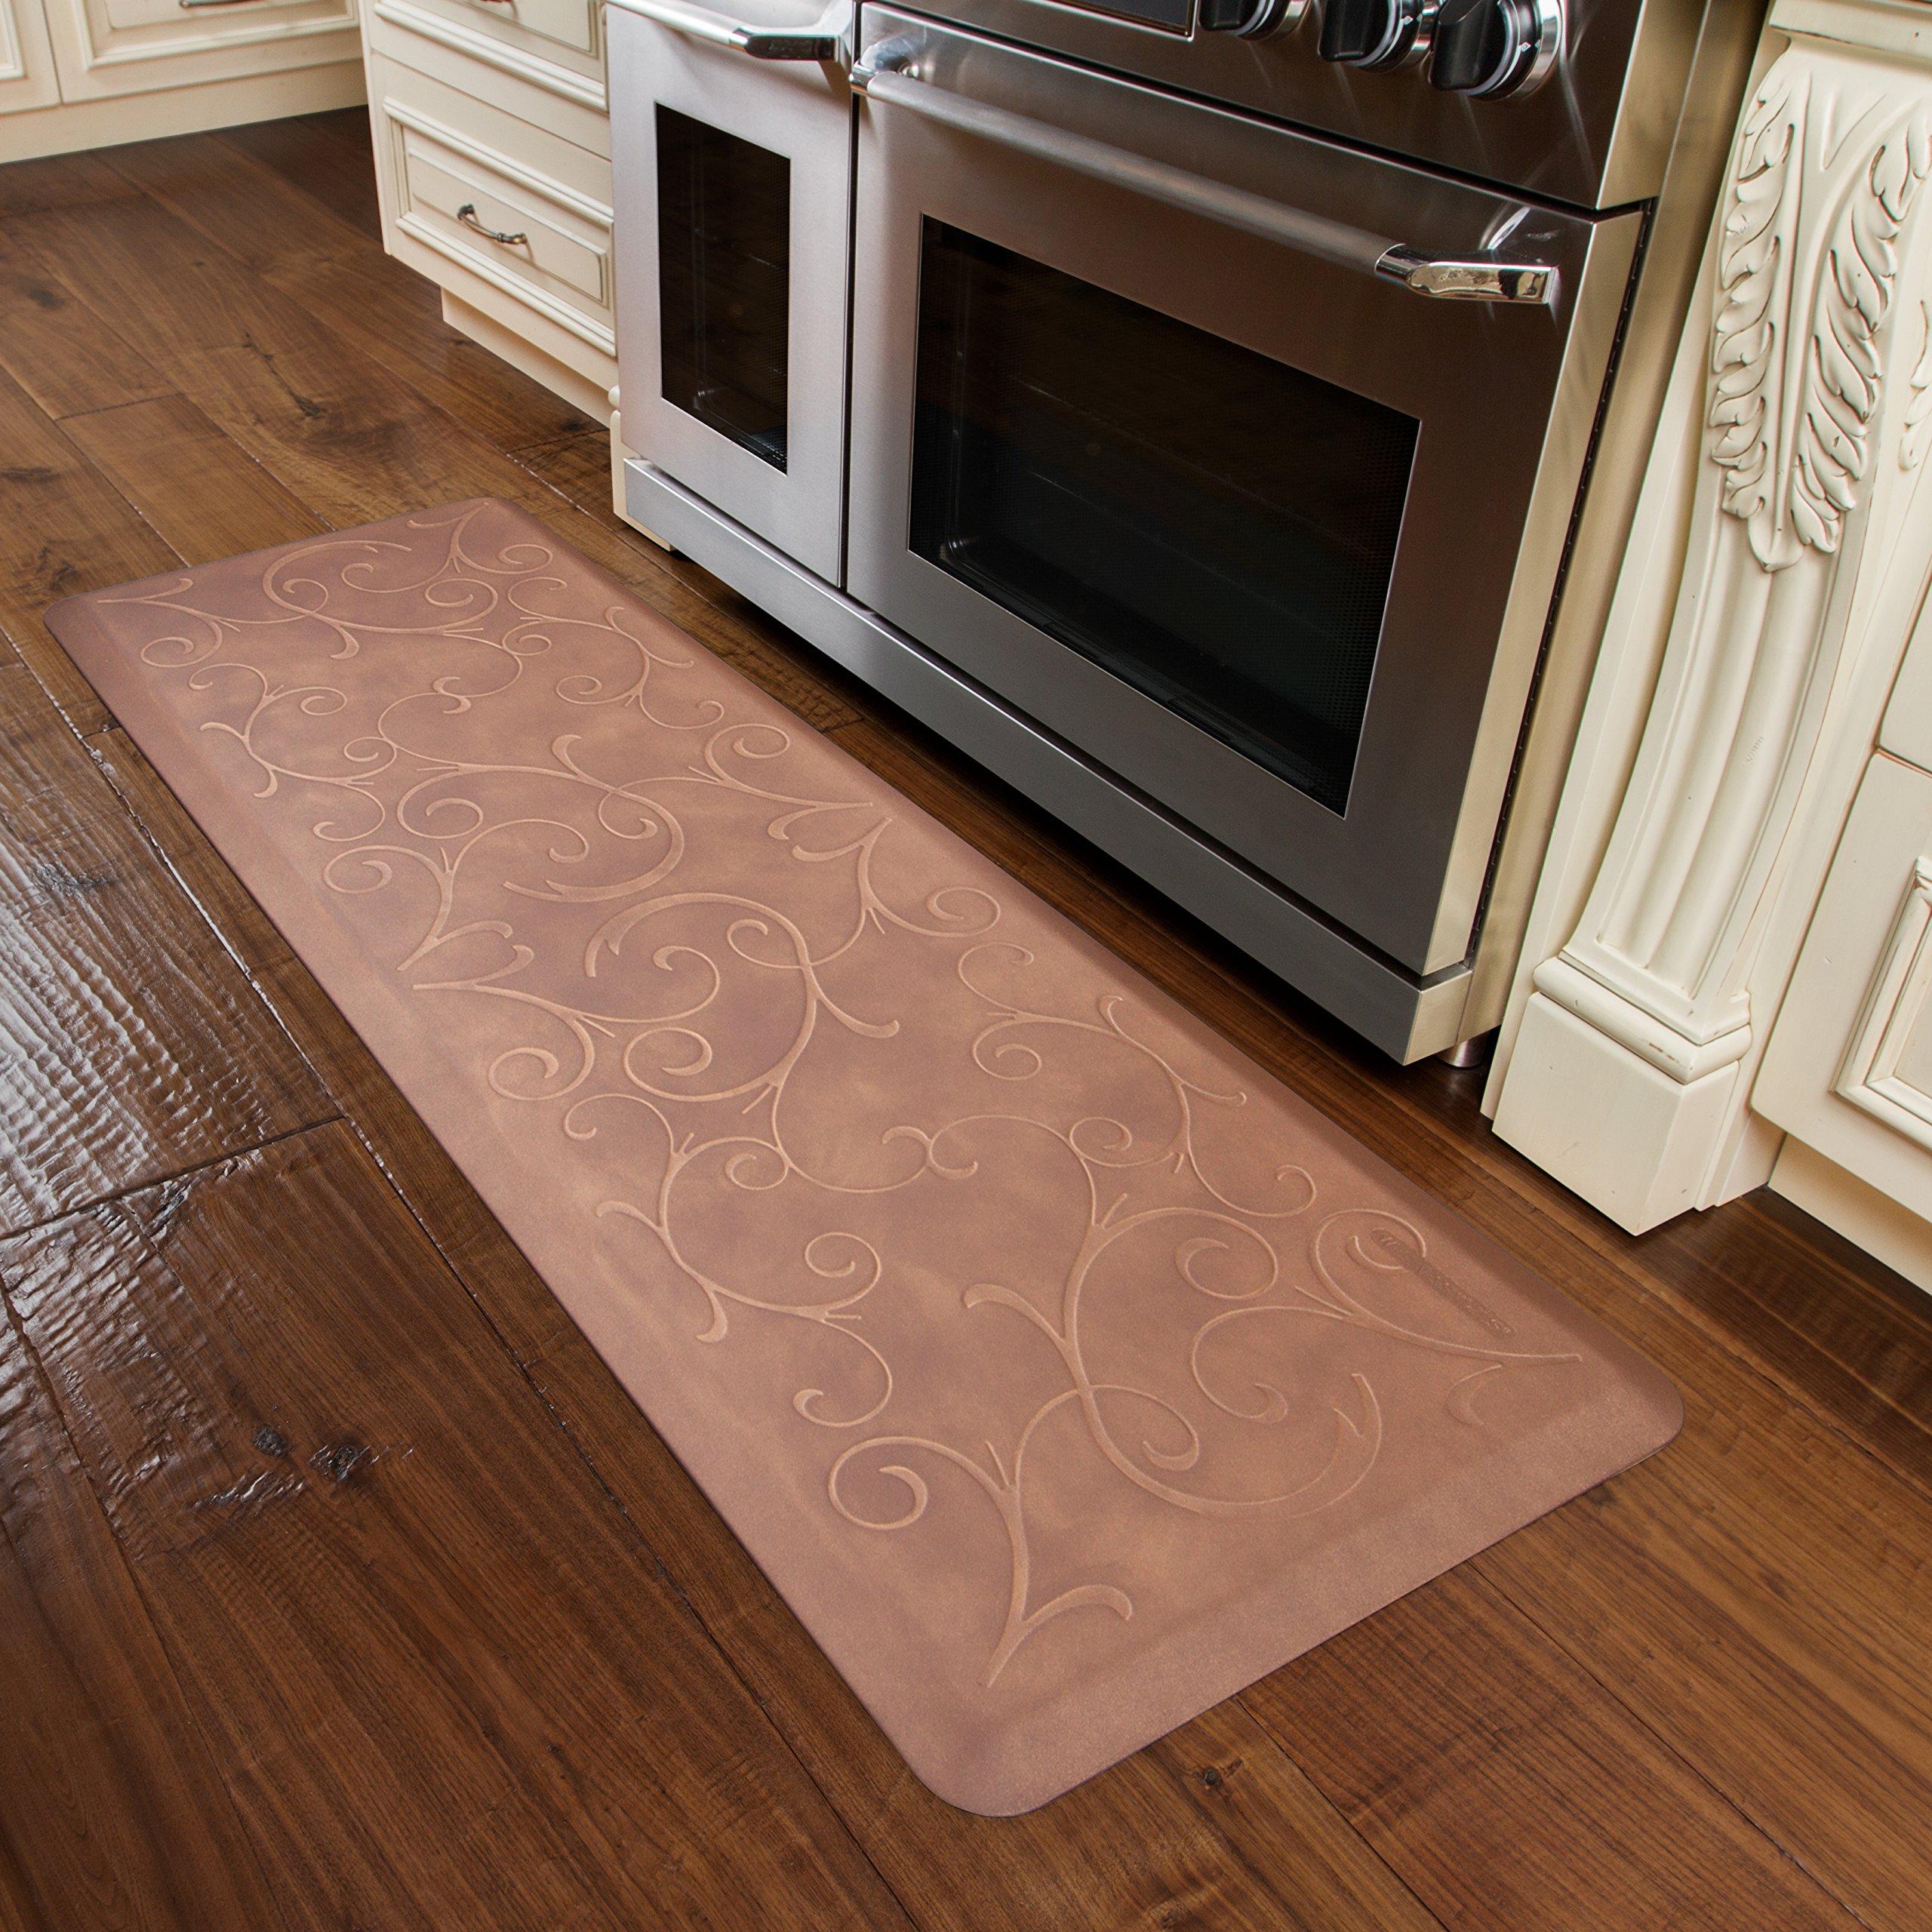 WellnessMats Estates Collection Essential Series Burnished Copper Bella 6 x 2 Foot Anti-Fatigue Mat